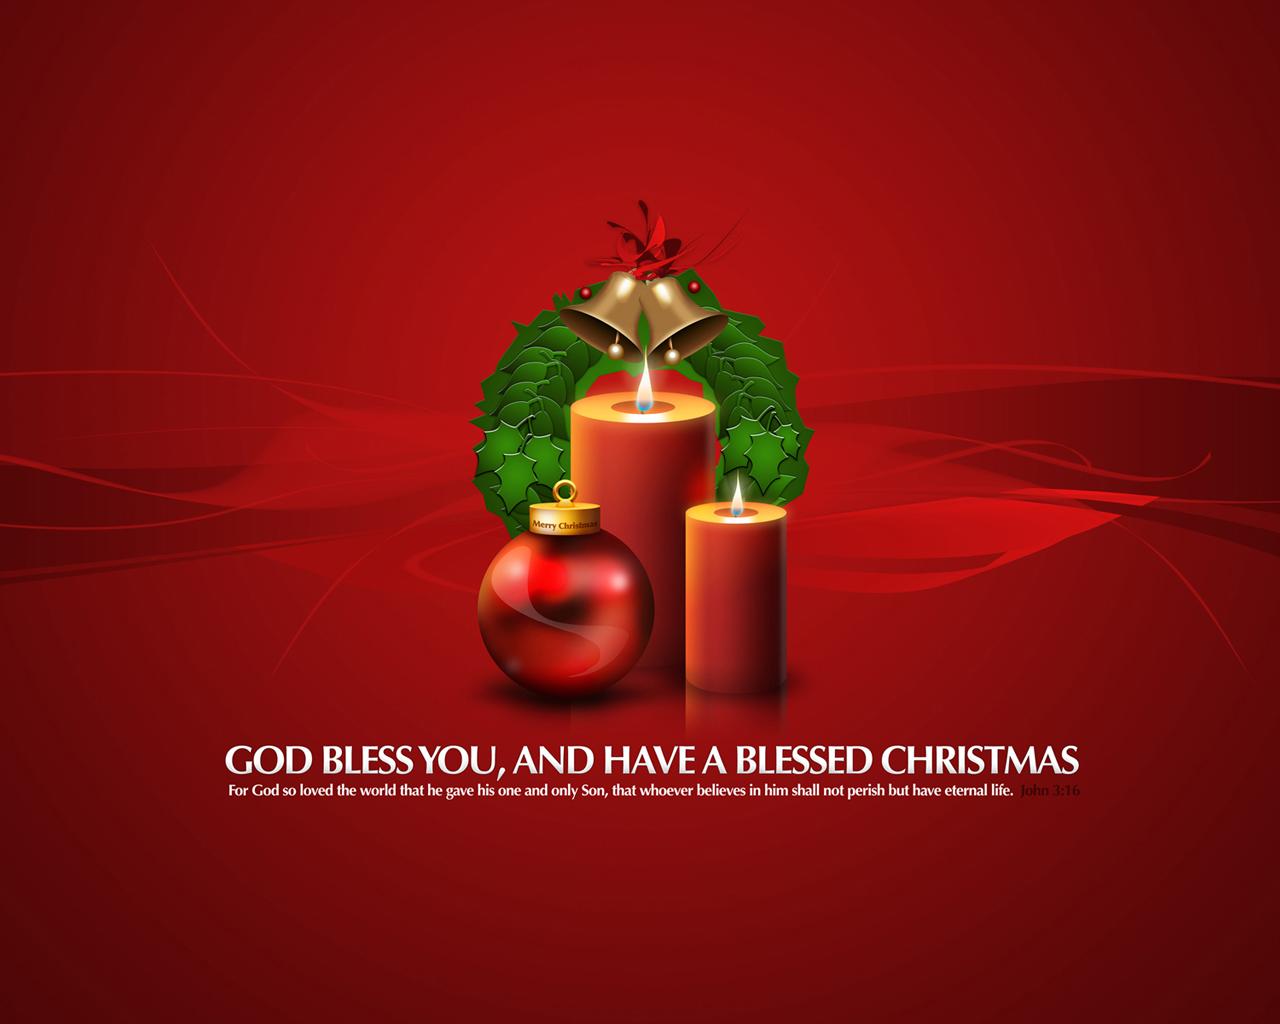 http://3.bp.blogspot.com/-td60Ajf9In8/TvchAmhjJVI/AAAAAAAALLE/PgF5tj0Cuuc/s1600/Blessed-Christmas.jpg